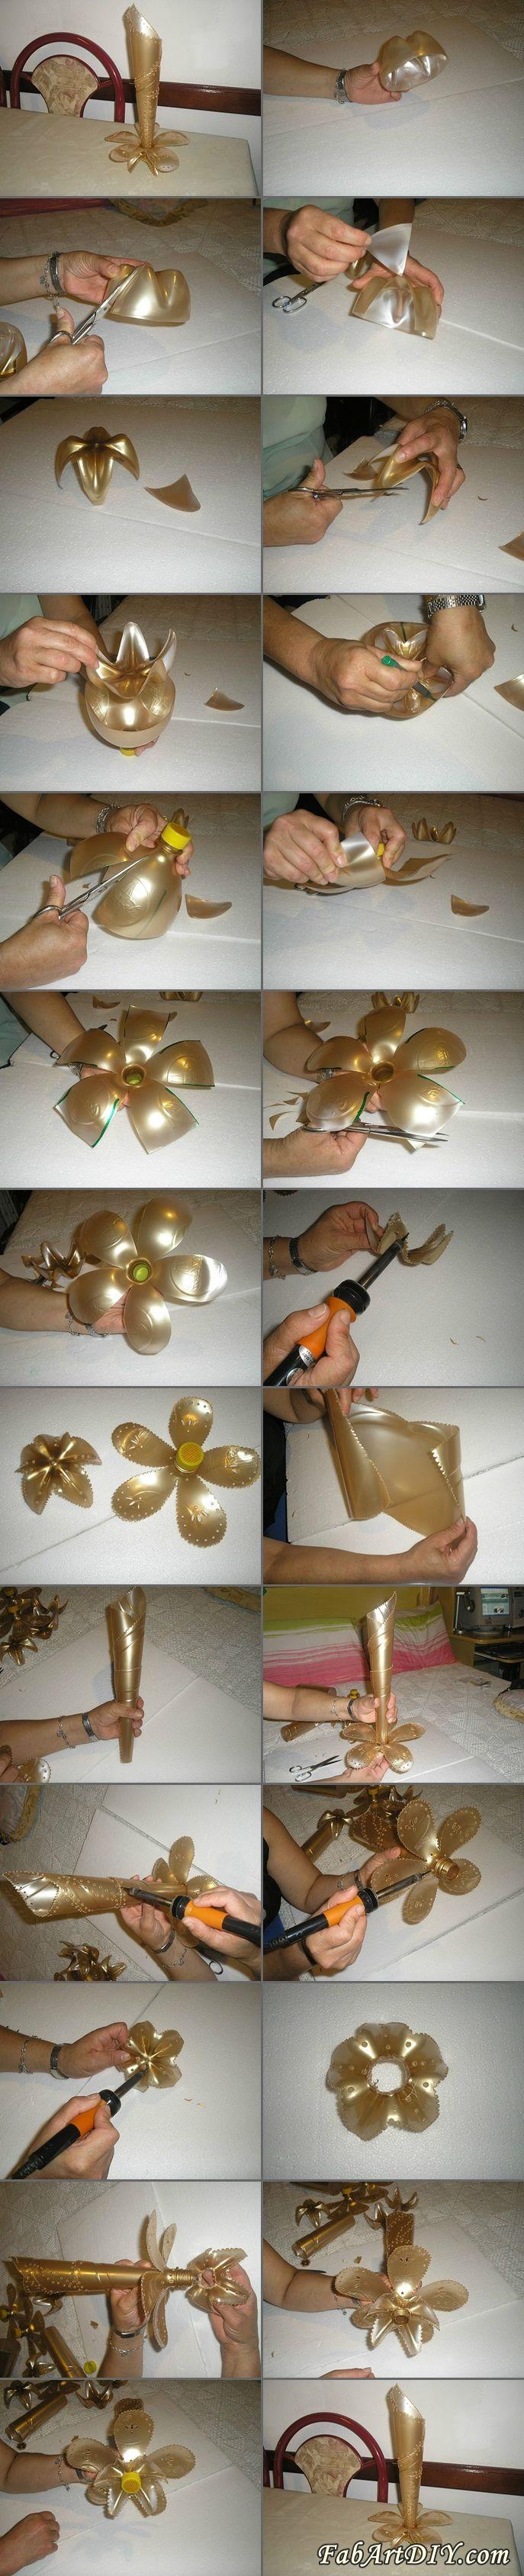 Stojánek z PETky DIY Delicate Vase From Plastic Bottle | www.FabArtDIY.com LIKE Us on Facebook ==> https://www.facebook.com/FabArtDIY